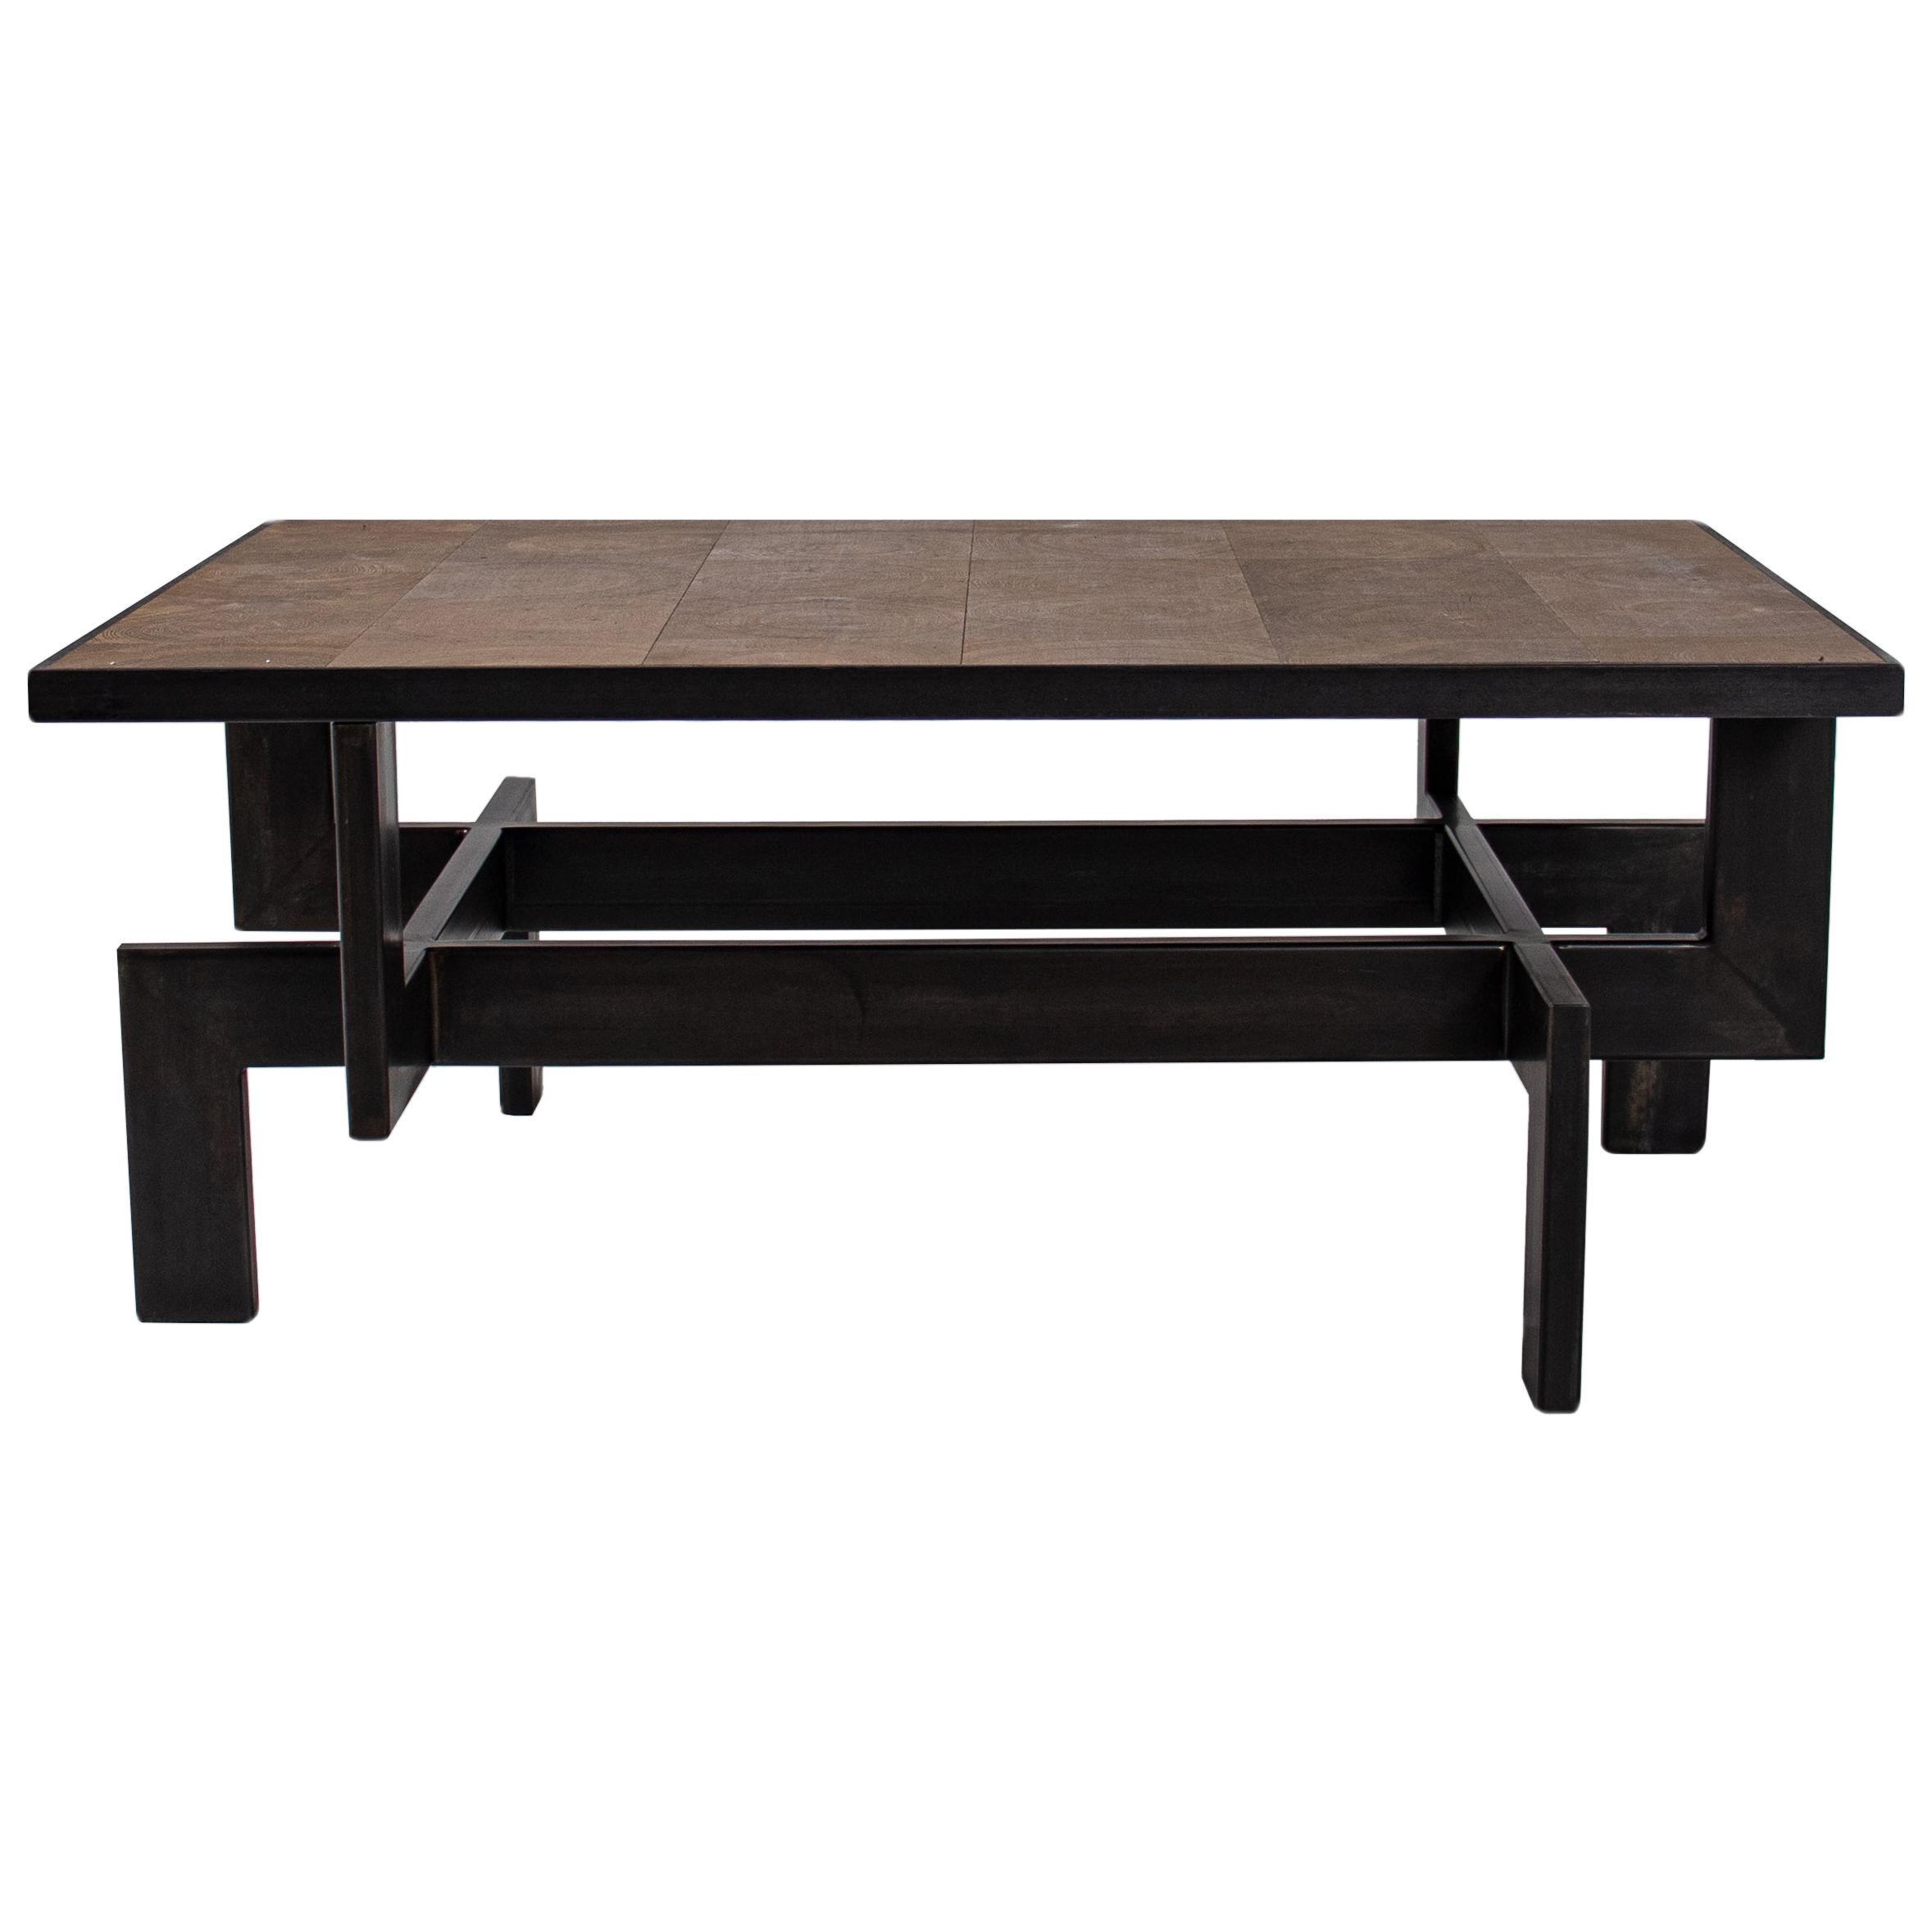 Black Steel Geometric Shape Coffee Table Base with Natural Oak Top